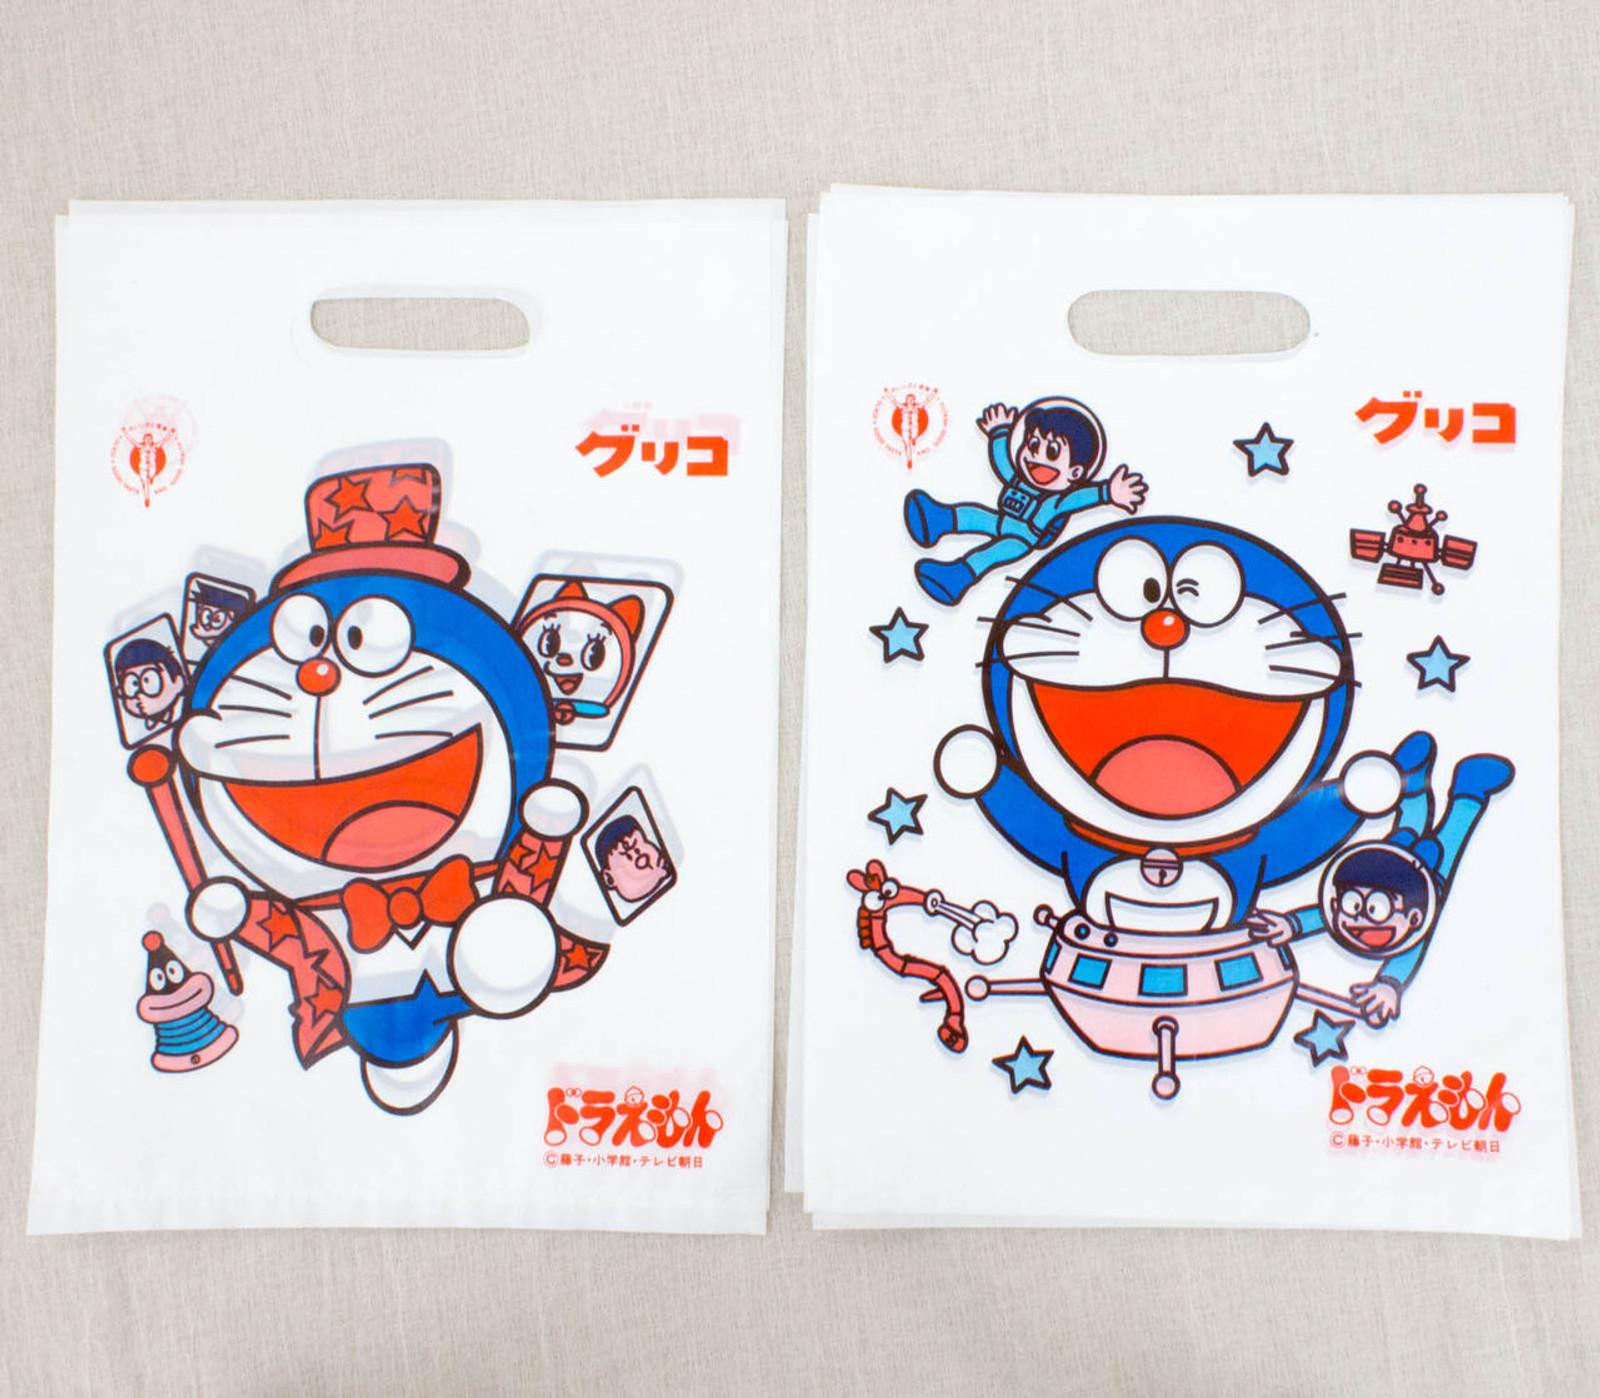 Retro RARE! Doraemon Glico Plastic Bag 10pc Set JAPAN ANIME MANGA